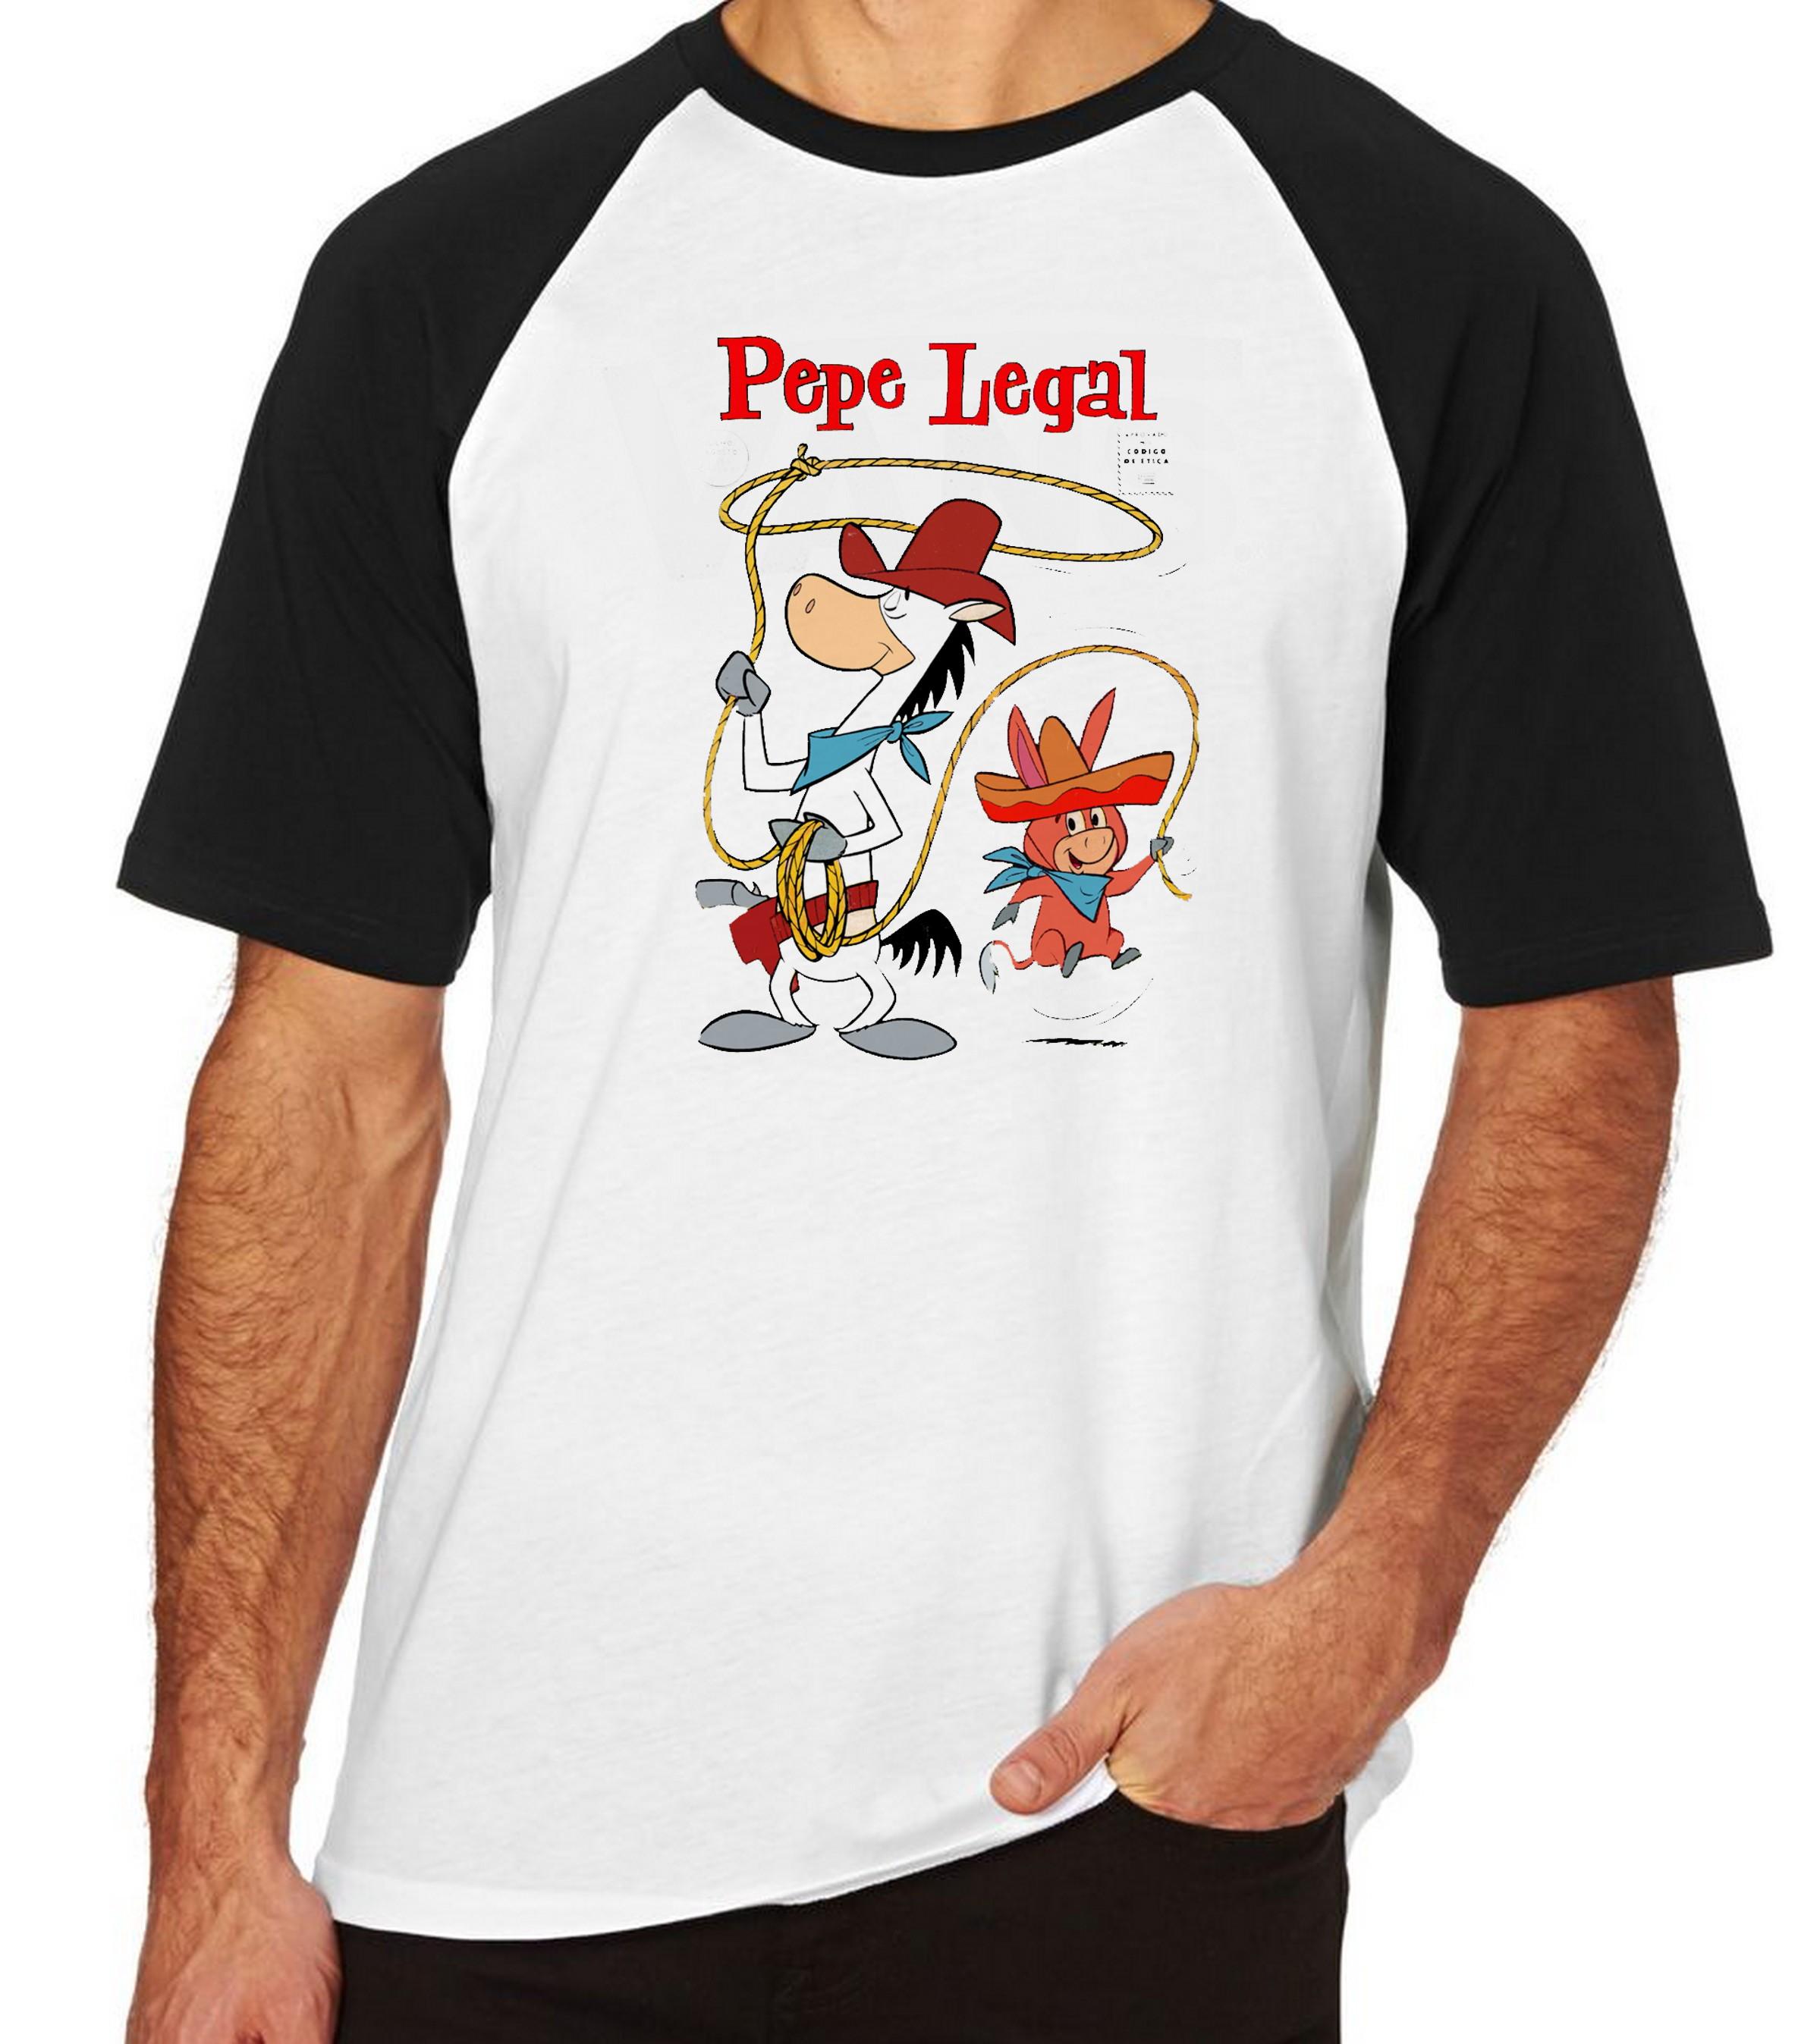 Camiseta Raglan Blusa Hanna Barbera Personagens Desenhos  735cdff57ae1f